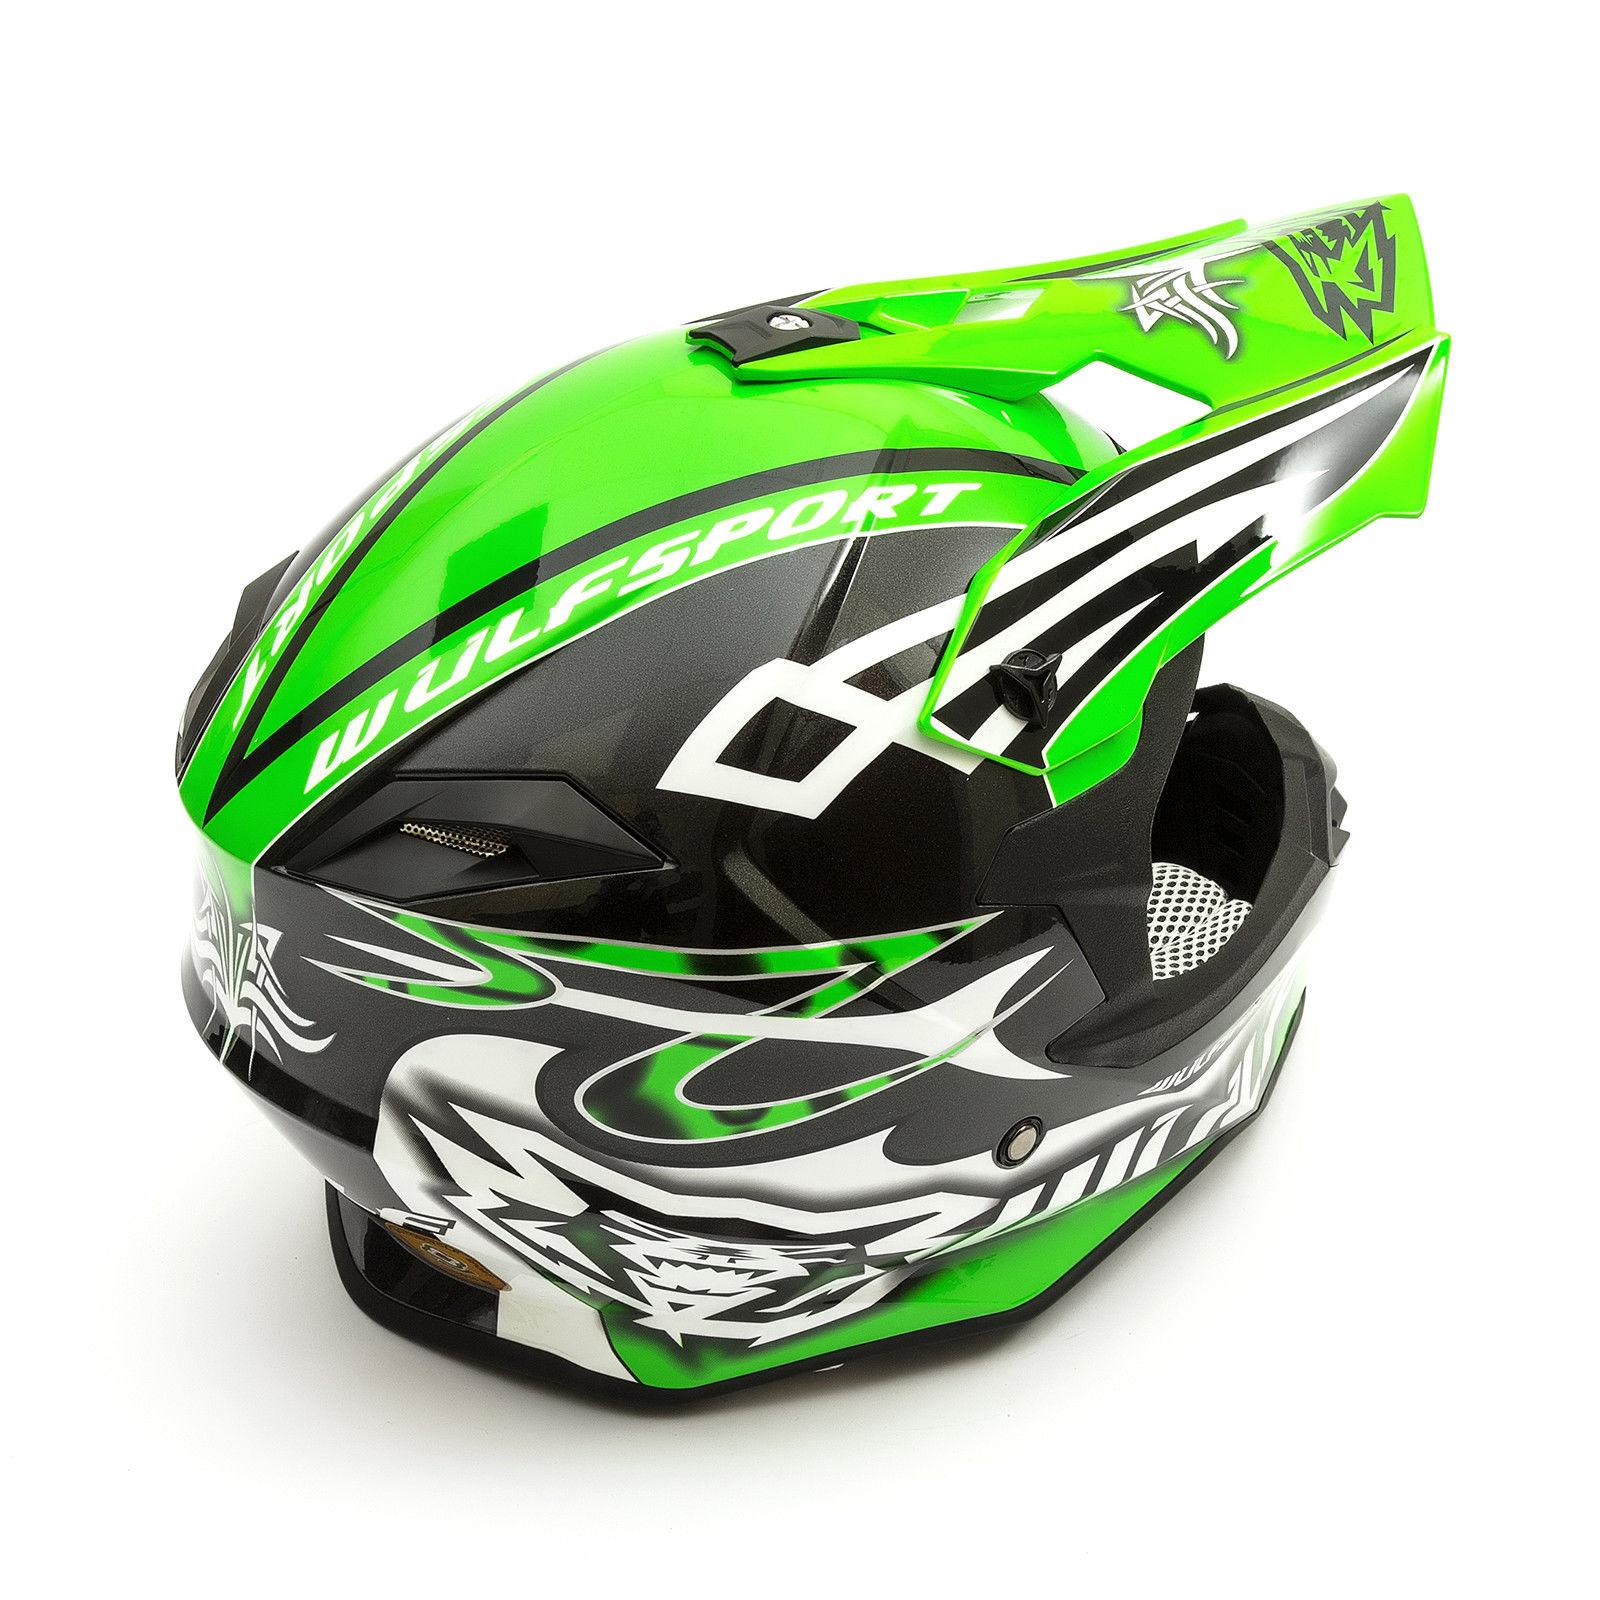 Wulfsport-Adult-Sceptre-Helmets-Motocross-Pitbike-Motorbike-Off-Road-Racing-ATV thumbnail 67